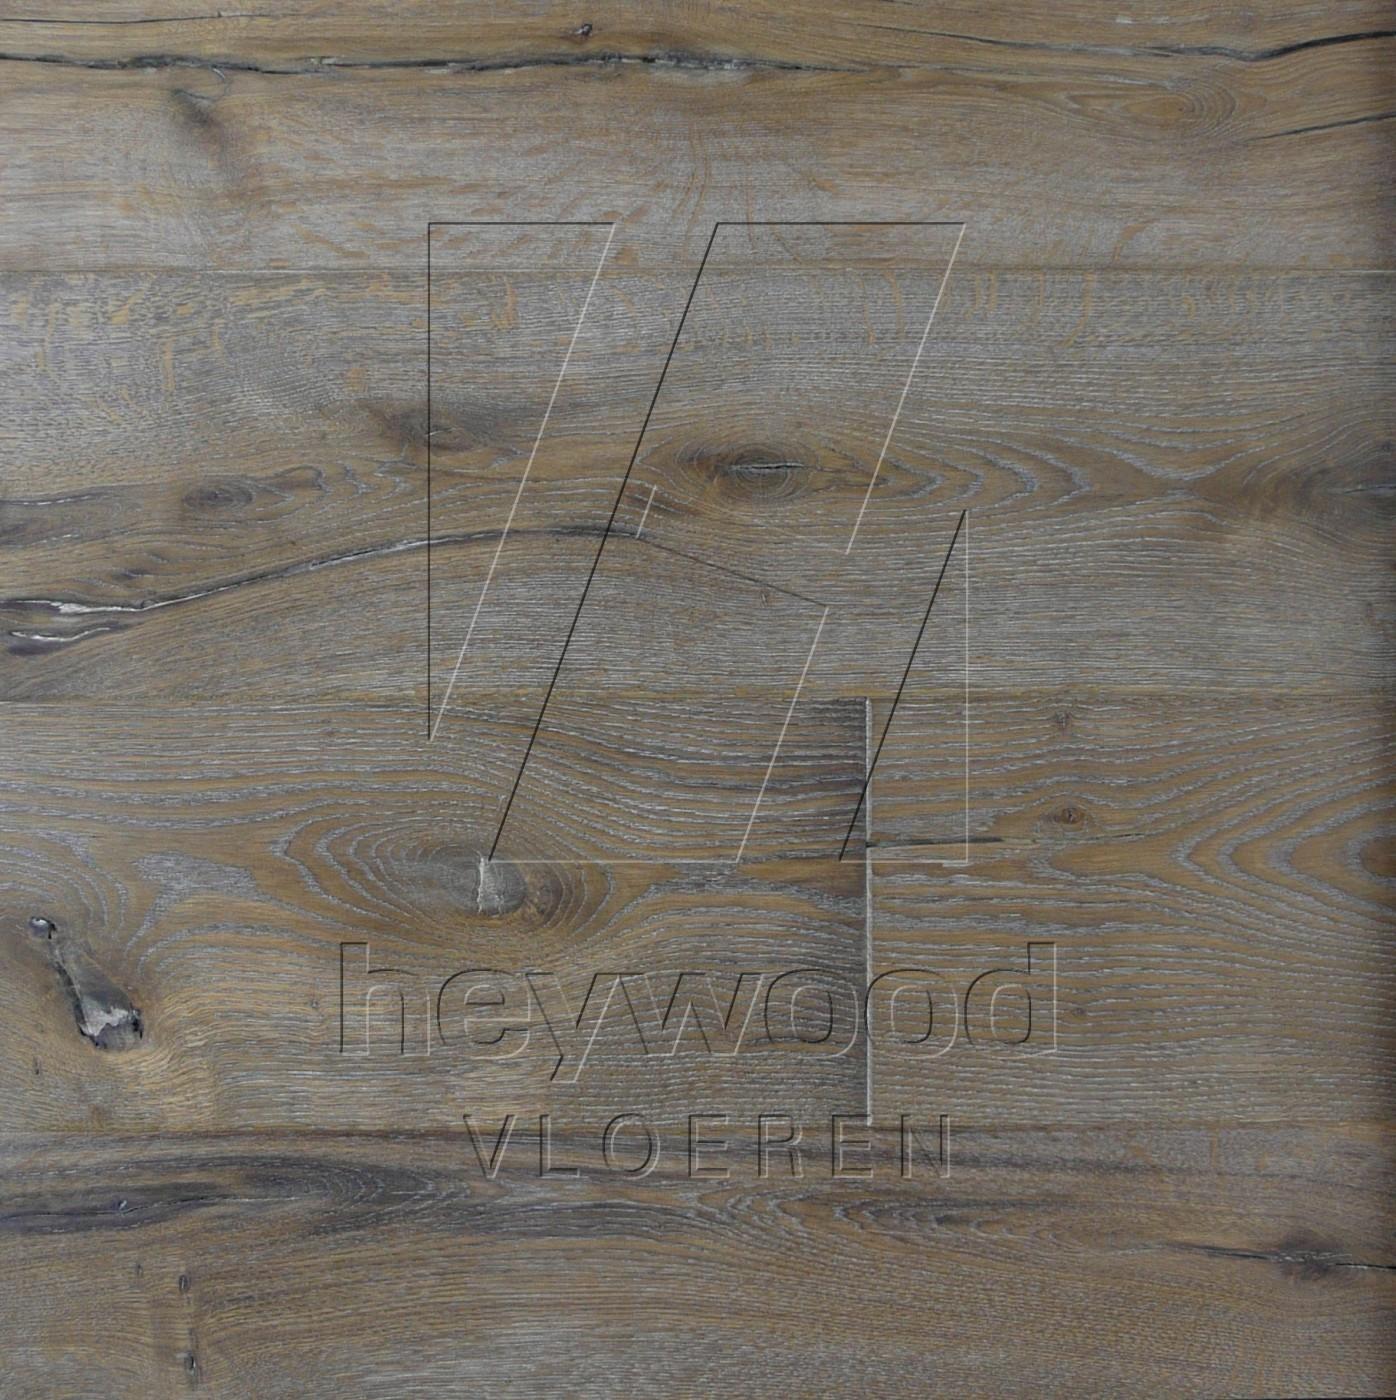 Karakoram in Aged Antique Surface of Aged Hardwood Floors